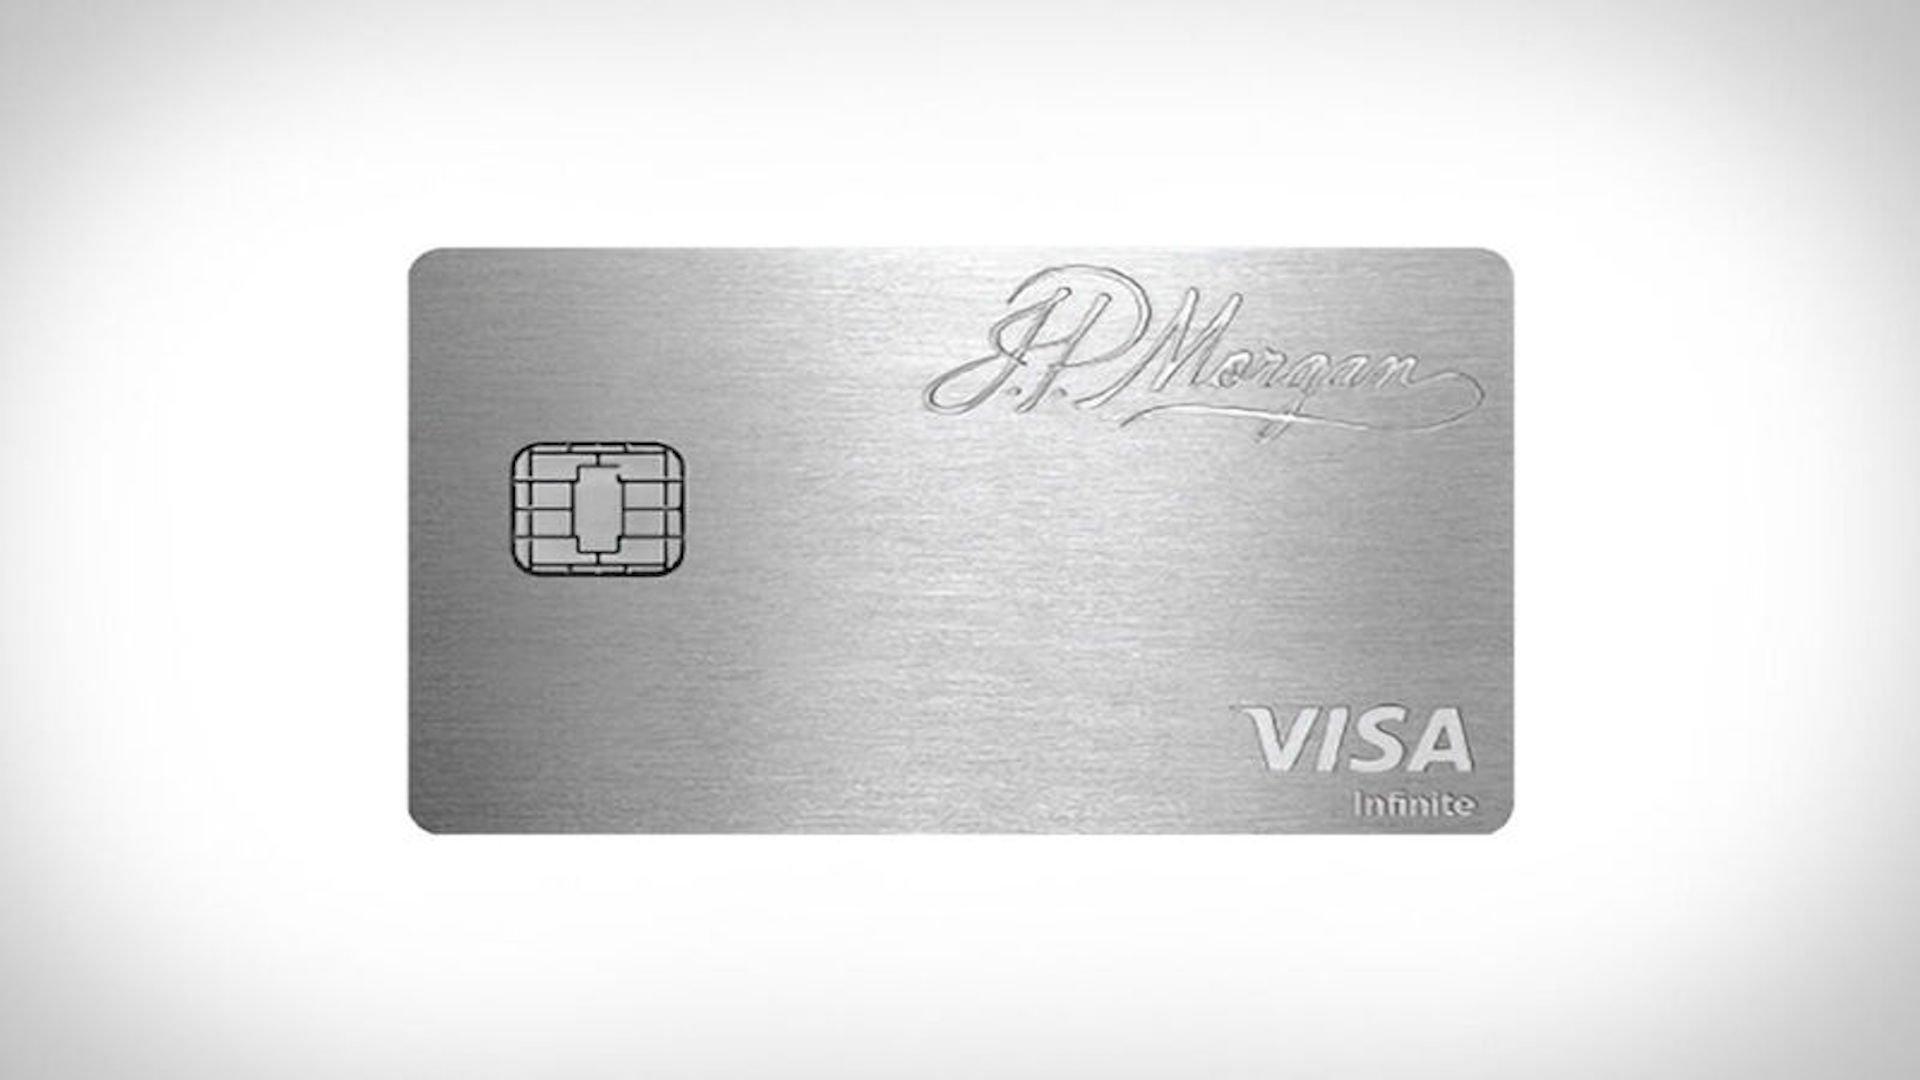 JP Morgan Chase Reserve Card